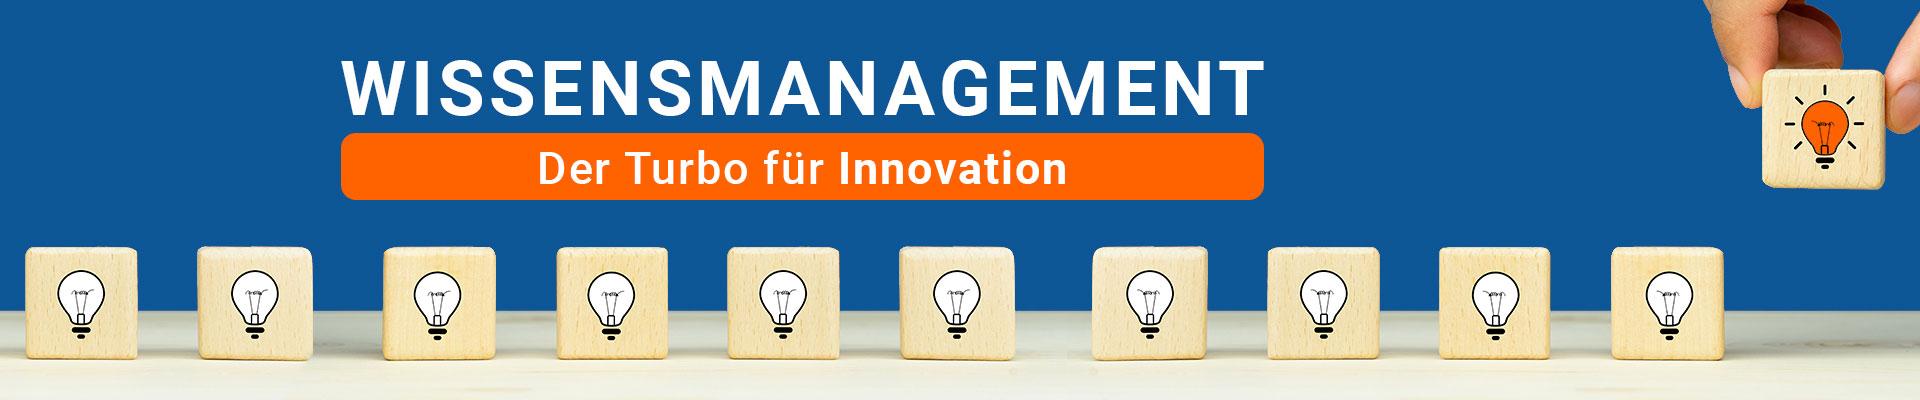 wissensmanagement-turbo-innovation-header